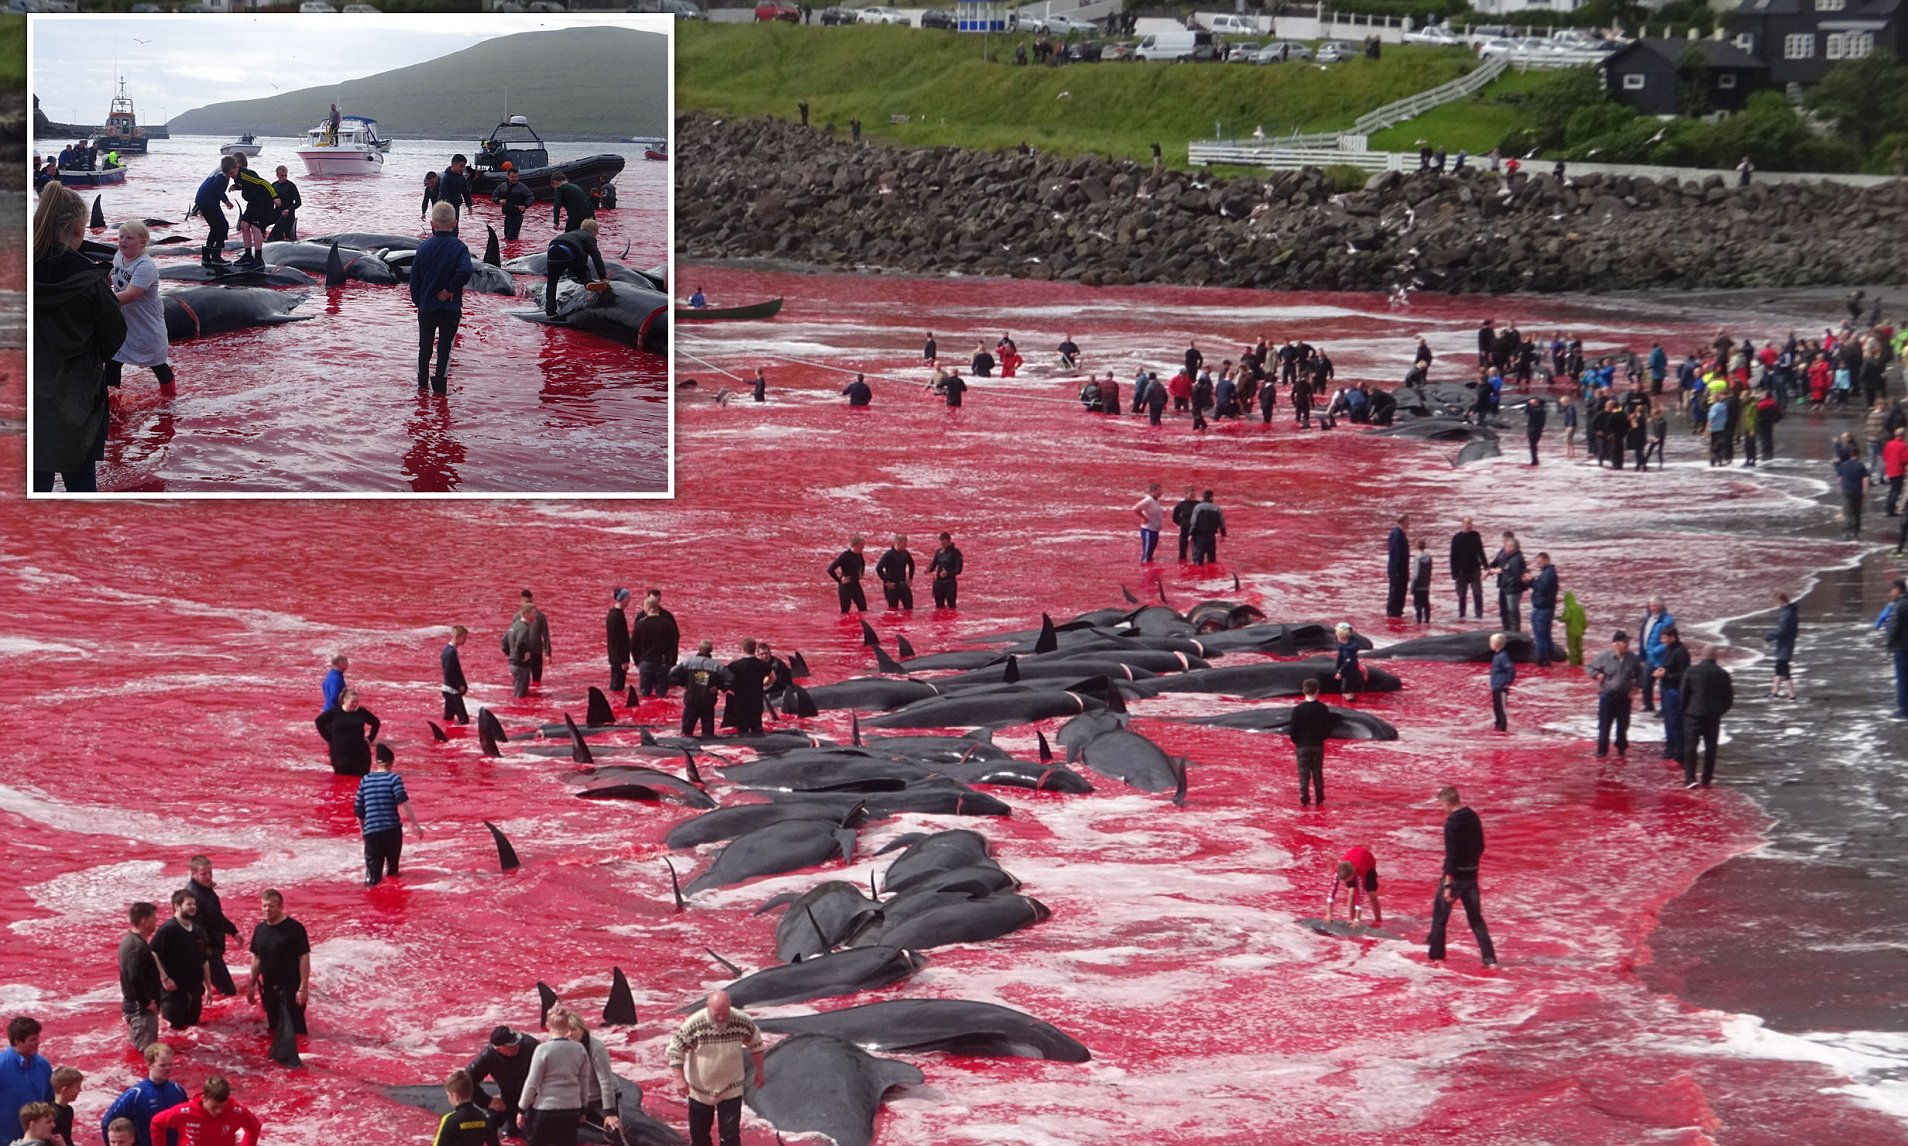 The Whale killings of Faroe Islands- Explained